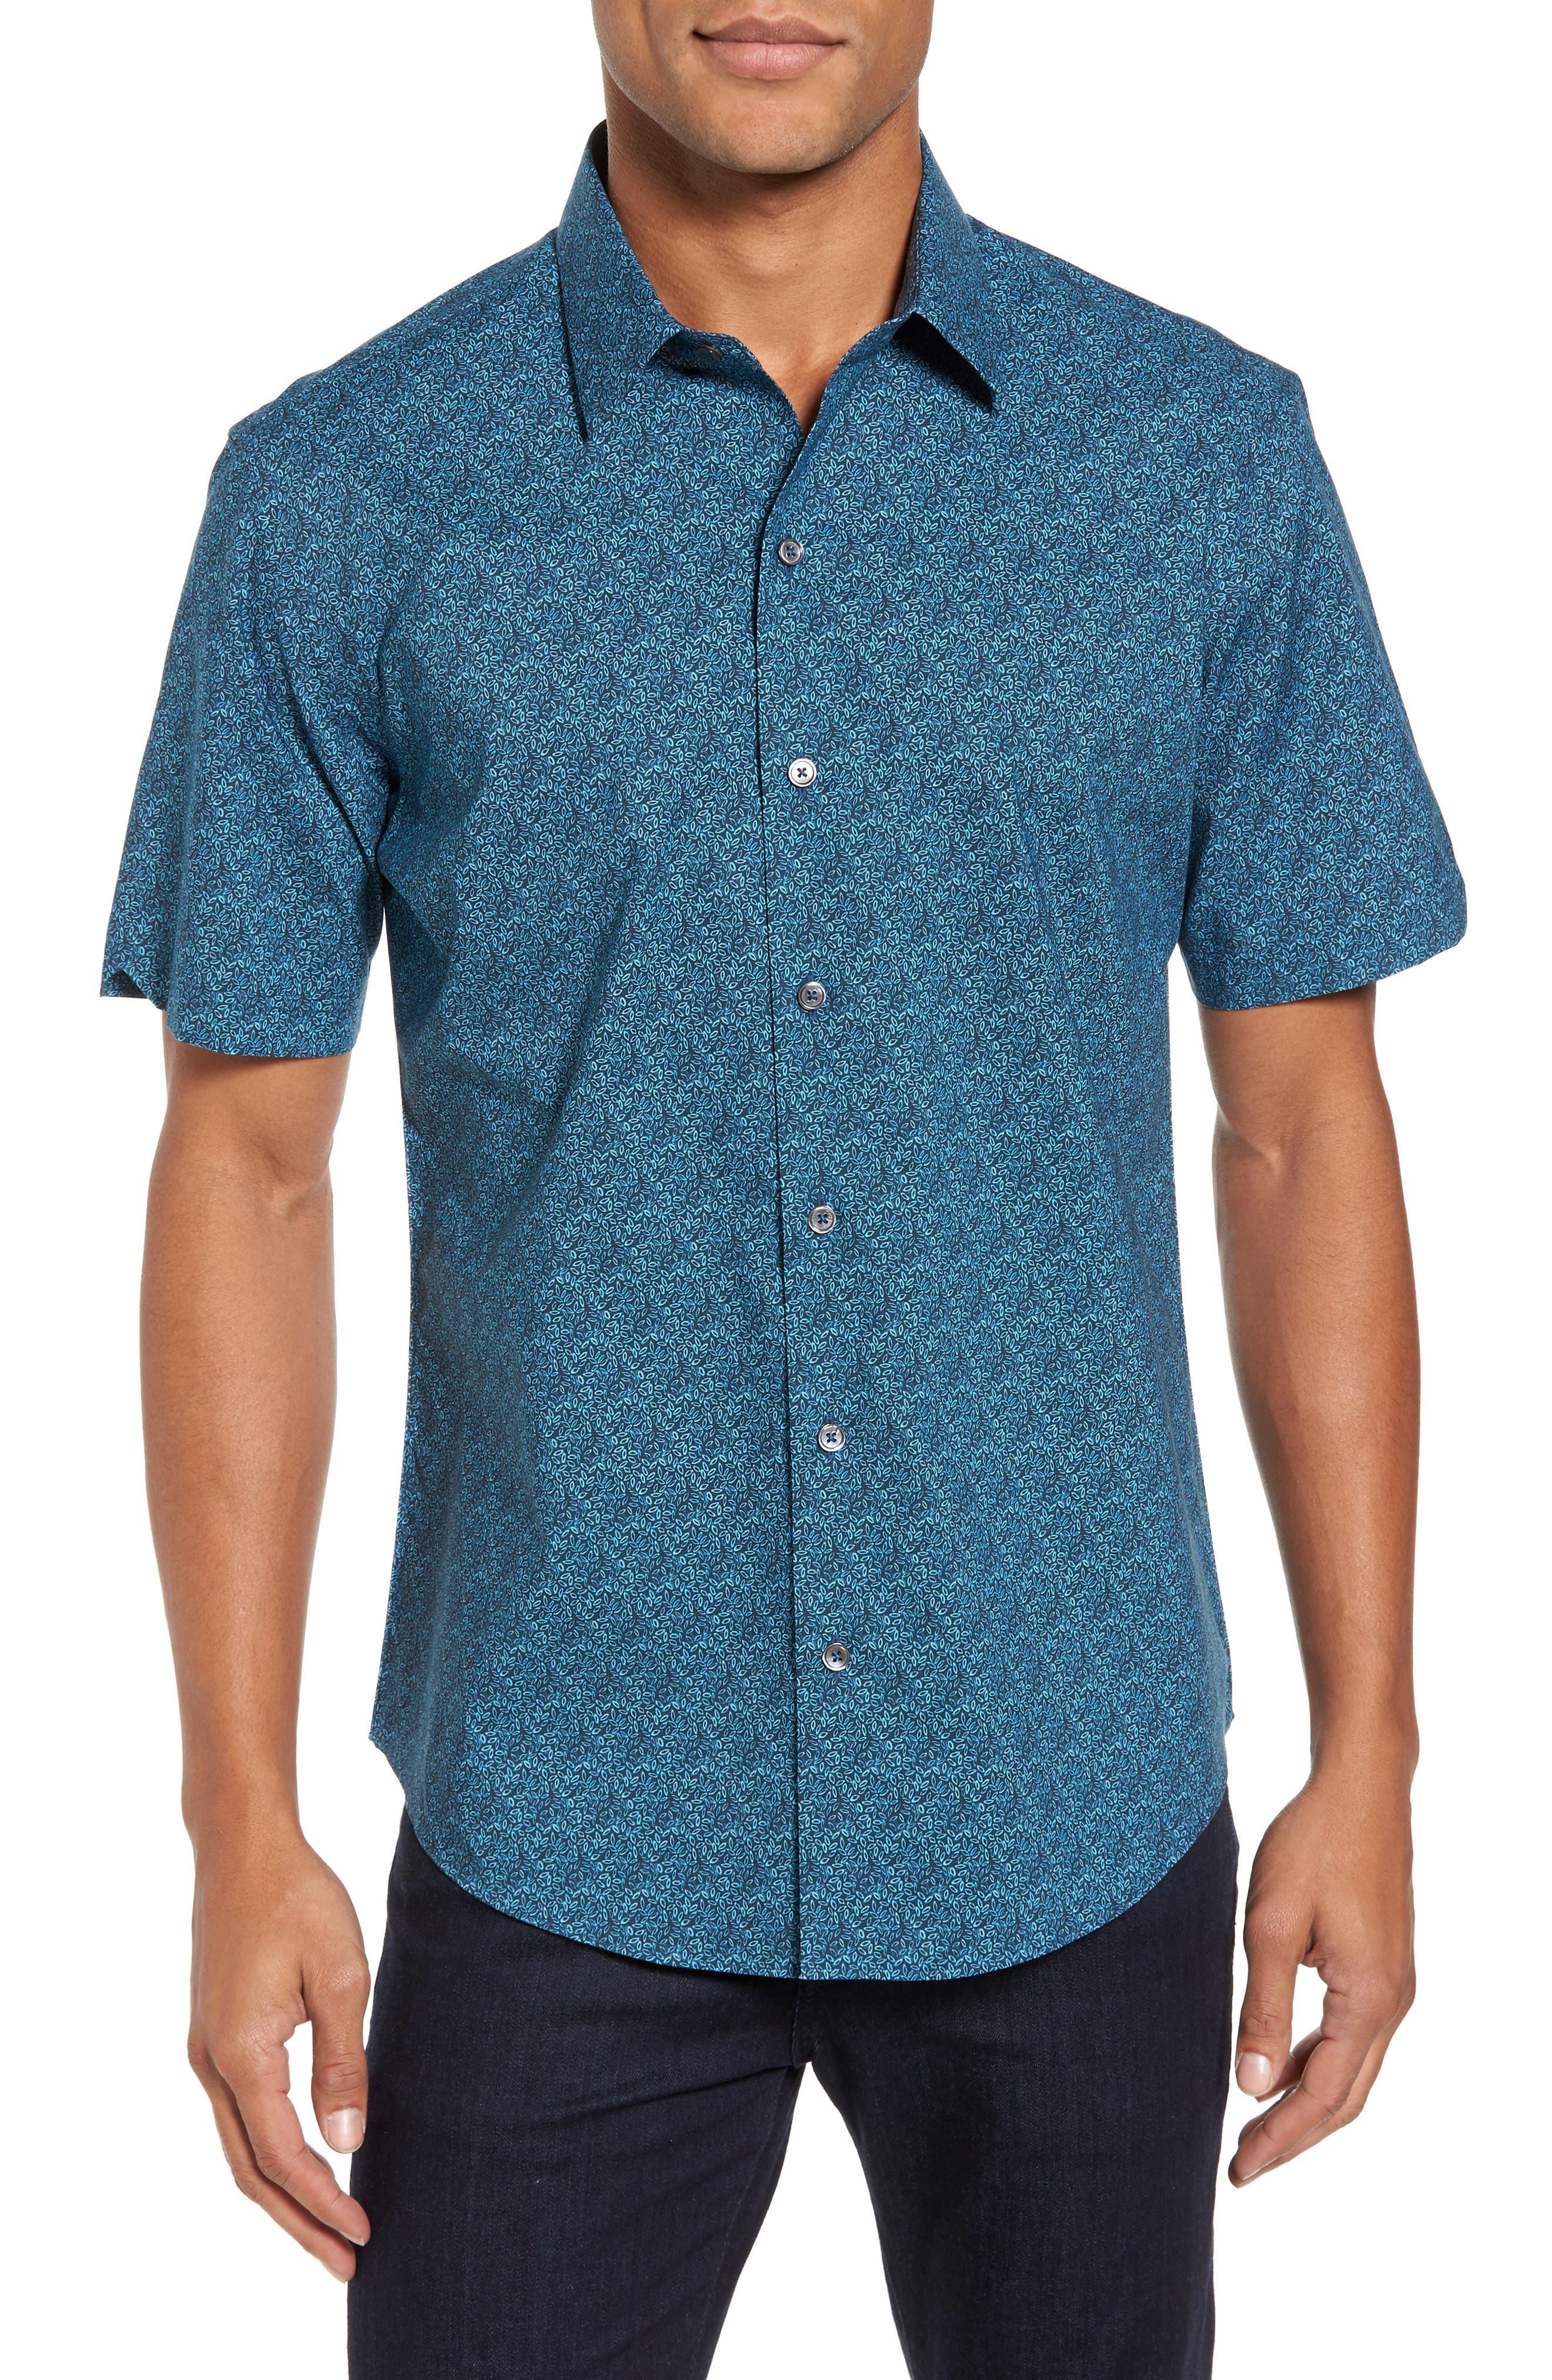 Machnee Slim Fit Print Sport Shirt,                             Main thumbnail 1, color,                             401